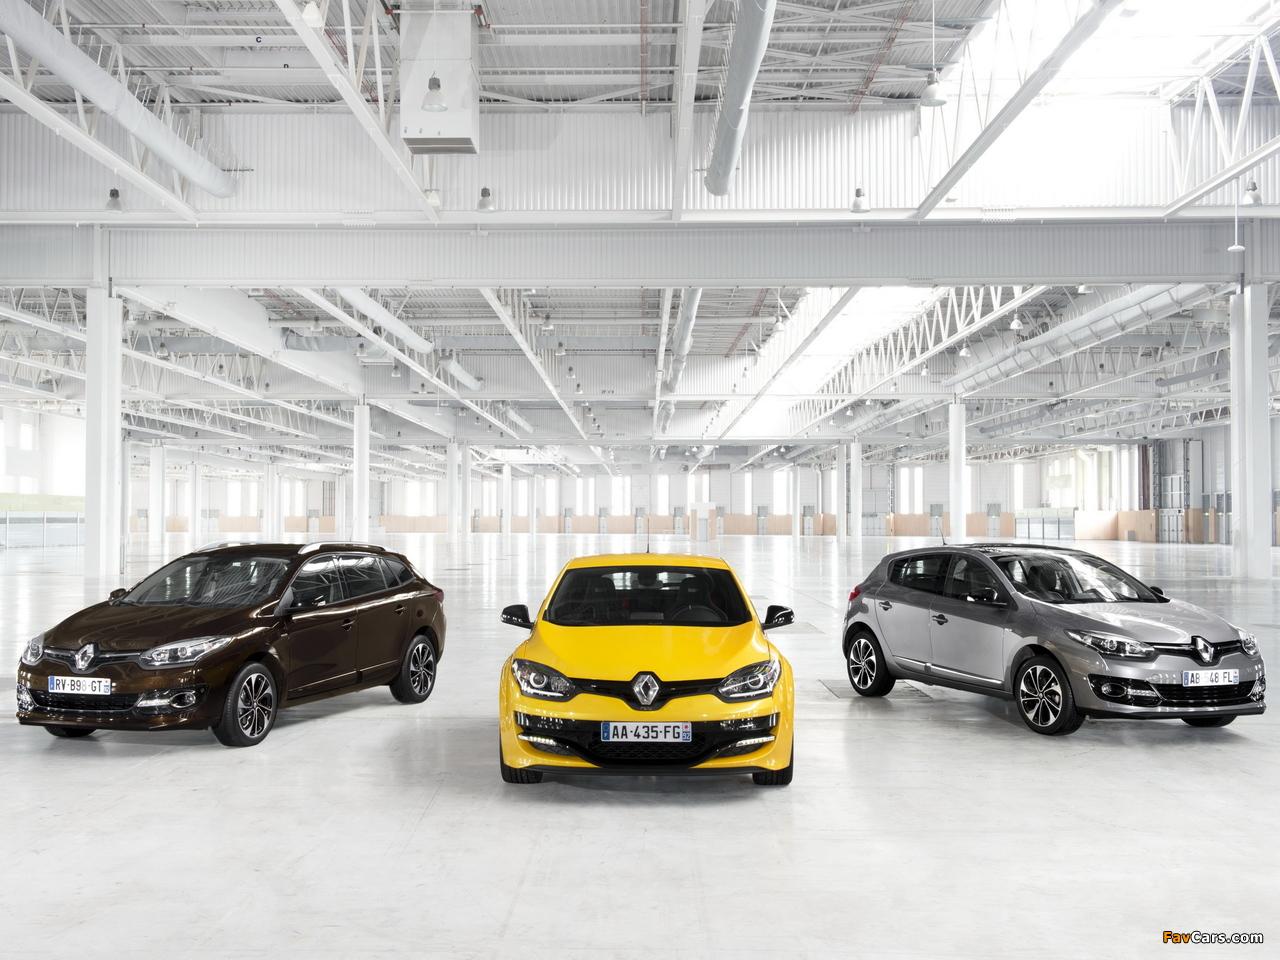 Renault Megane wallpapers (1280 x 960)